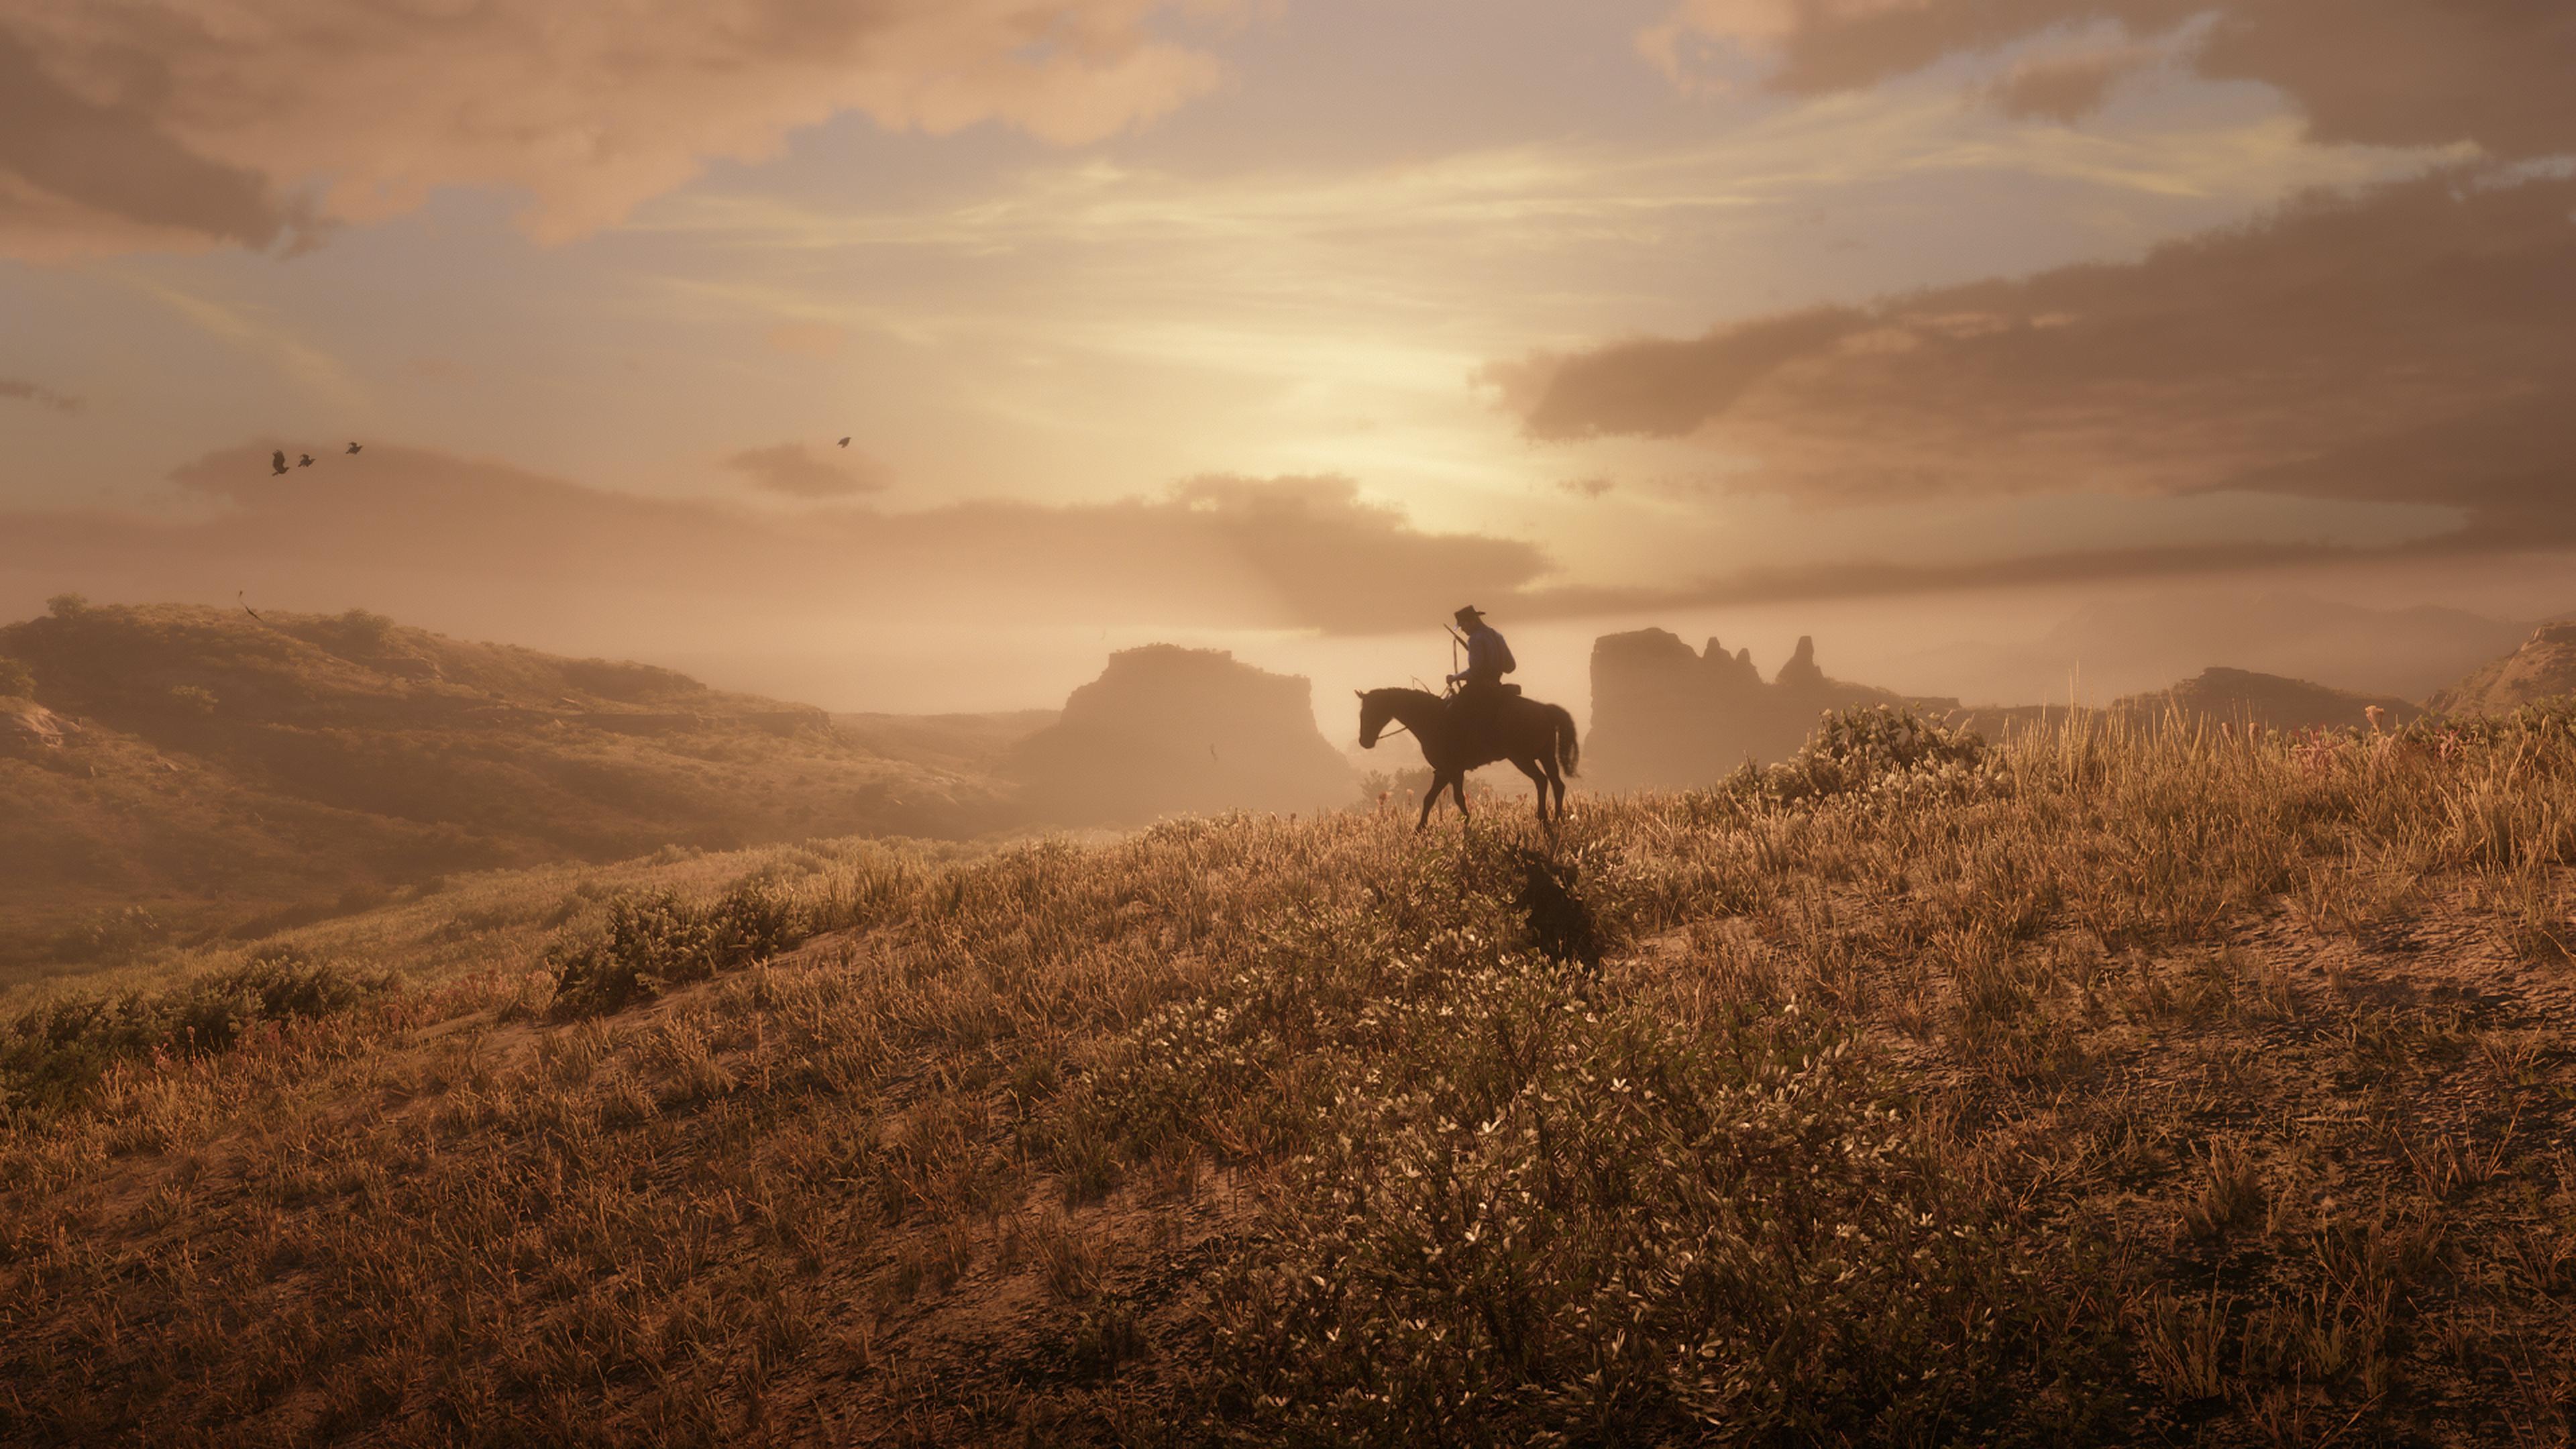 1280x1024 Red Dead Redemption 2 Xbox One 4k 1280x1024 Resolution